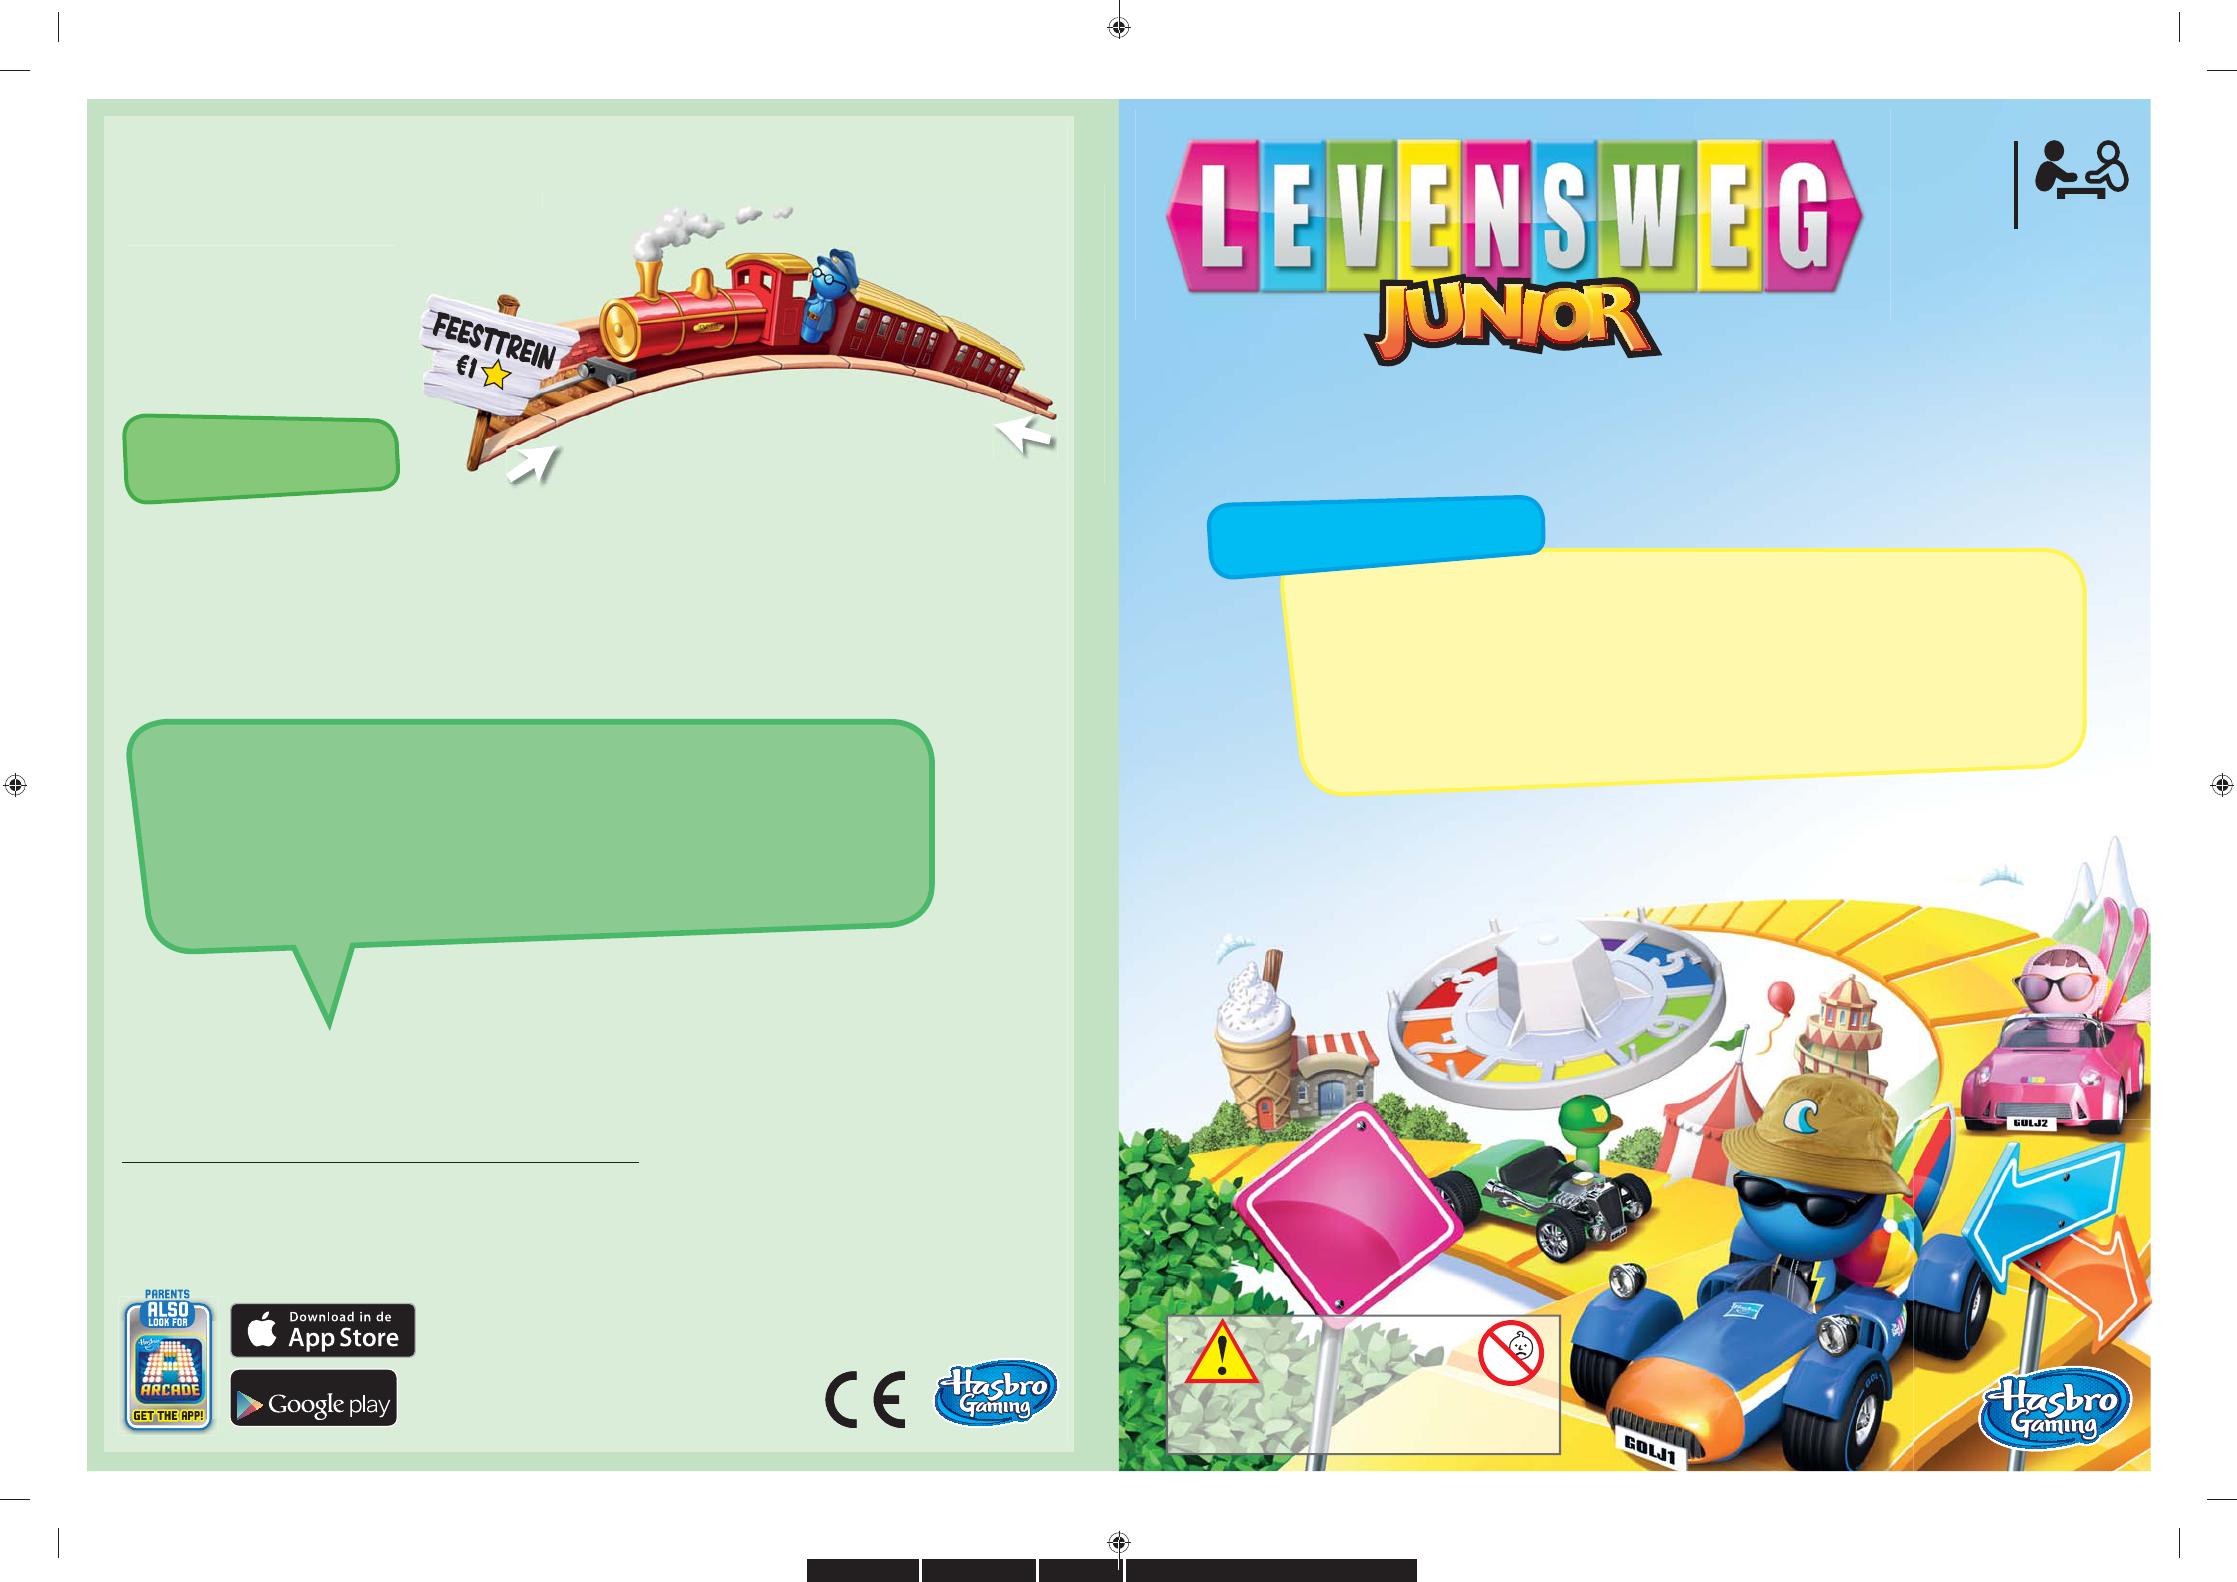 Handleiding Hasbro Levensweg Junior Pagina 1 Van 2 Nederlands